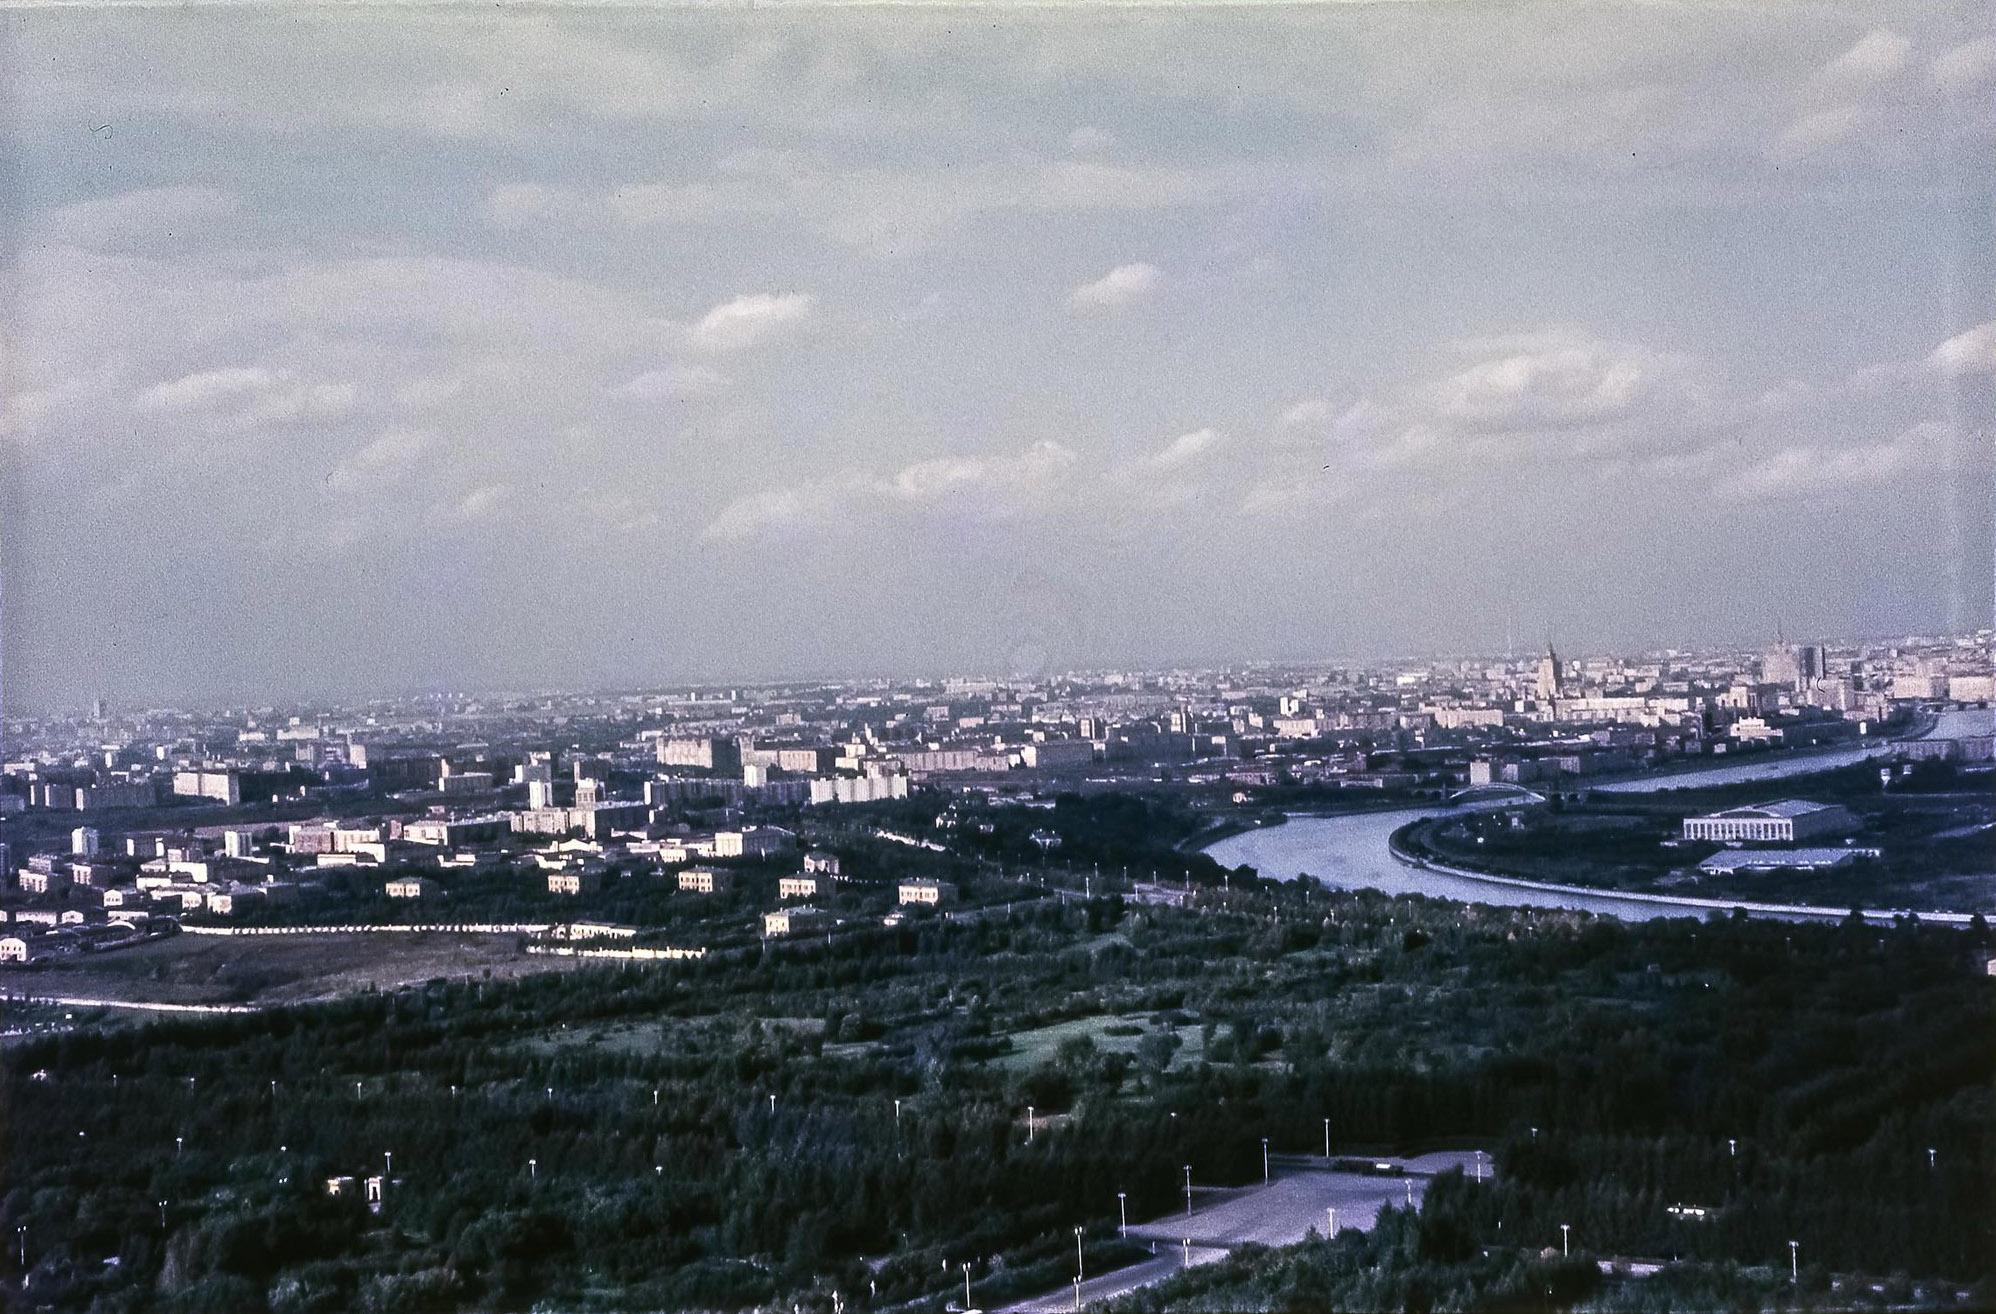 МГУ. Вид на север с Главного здания МГУ